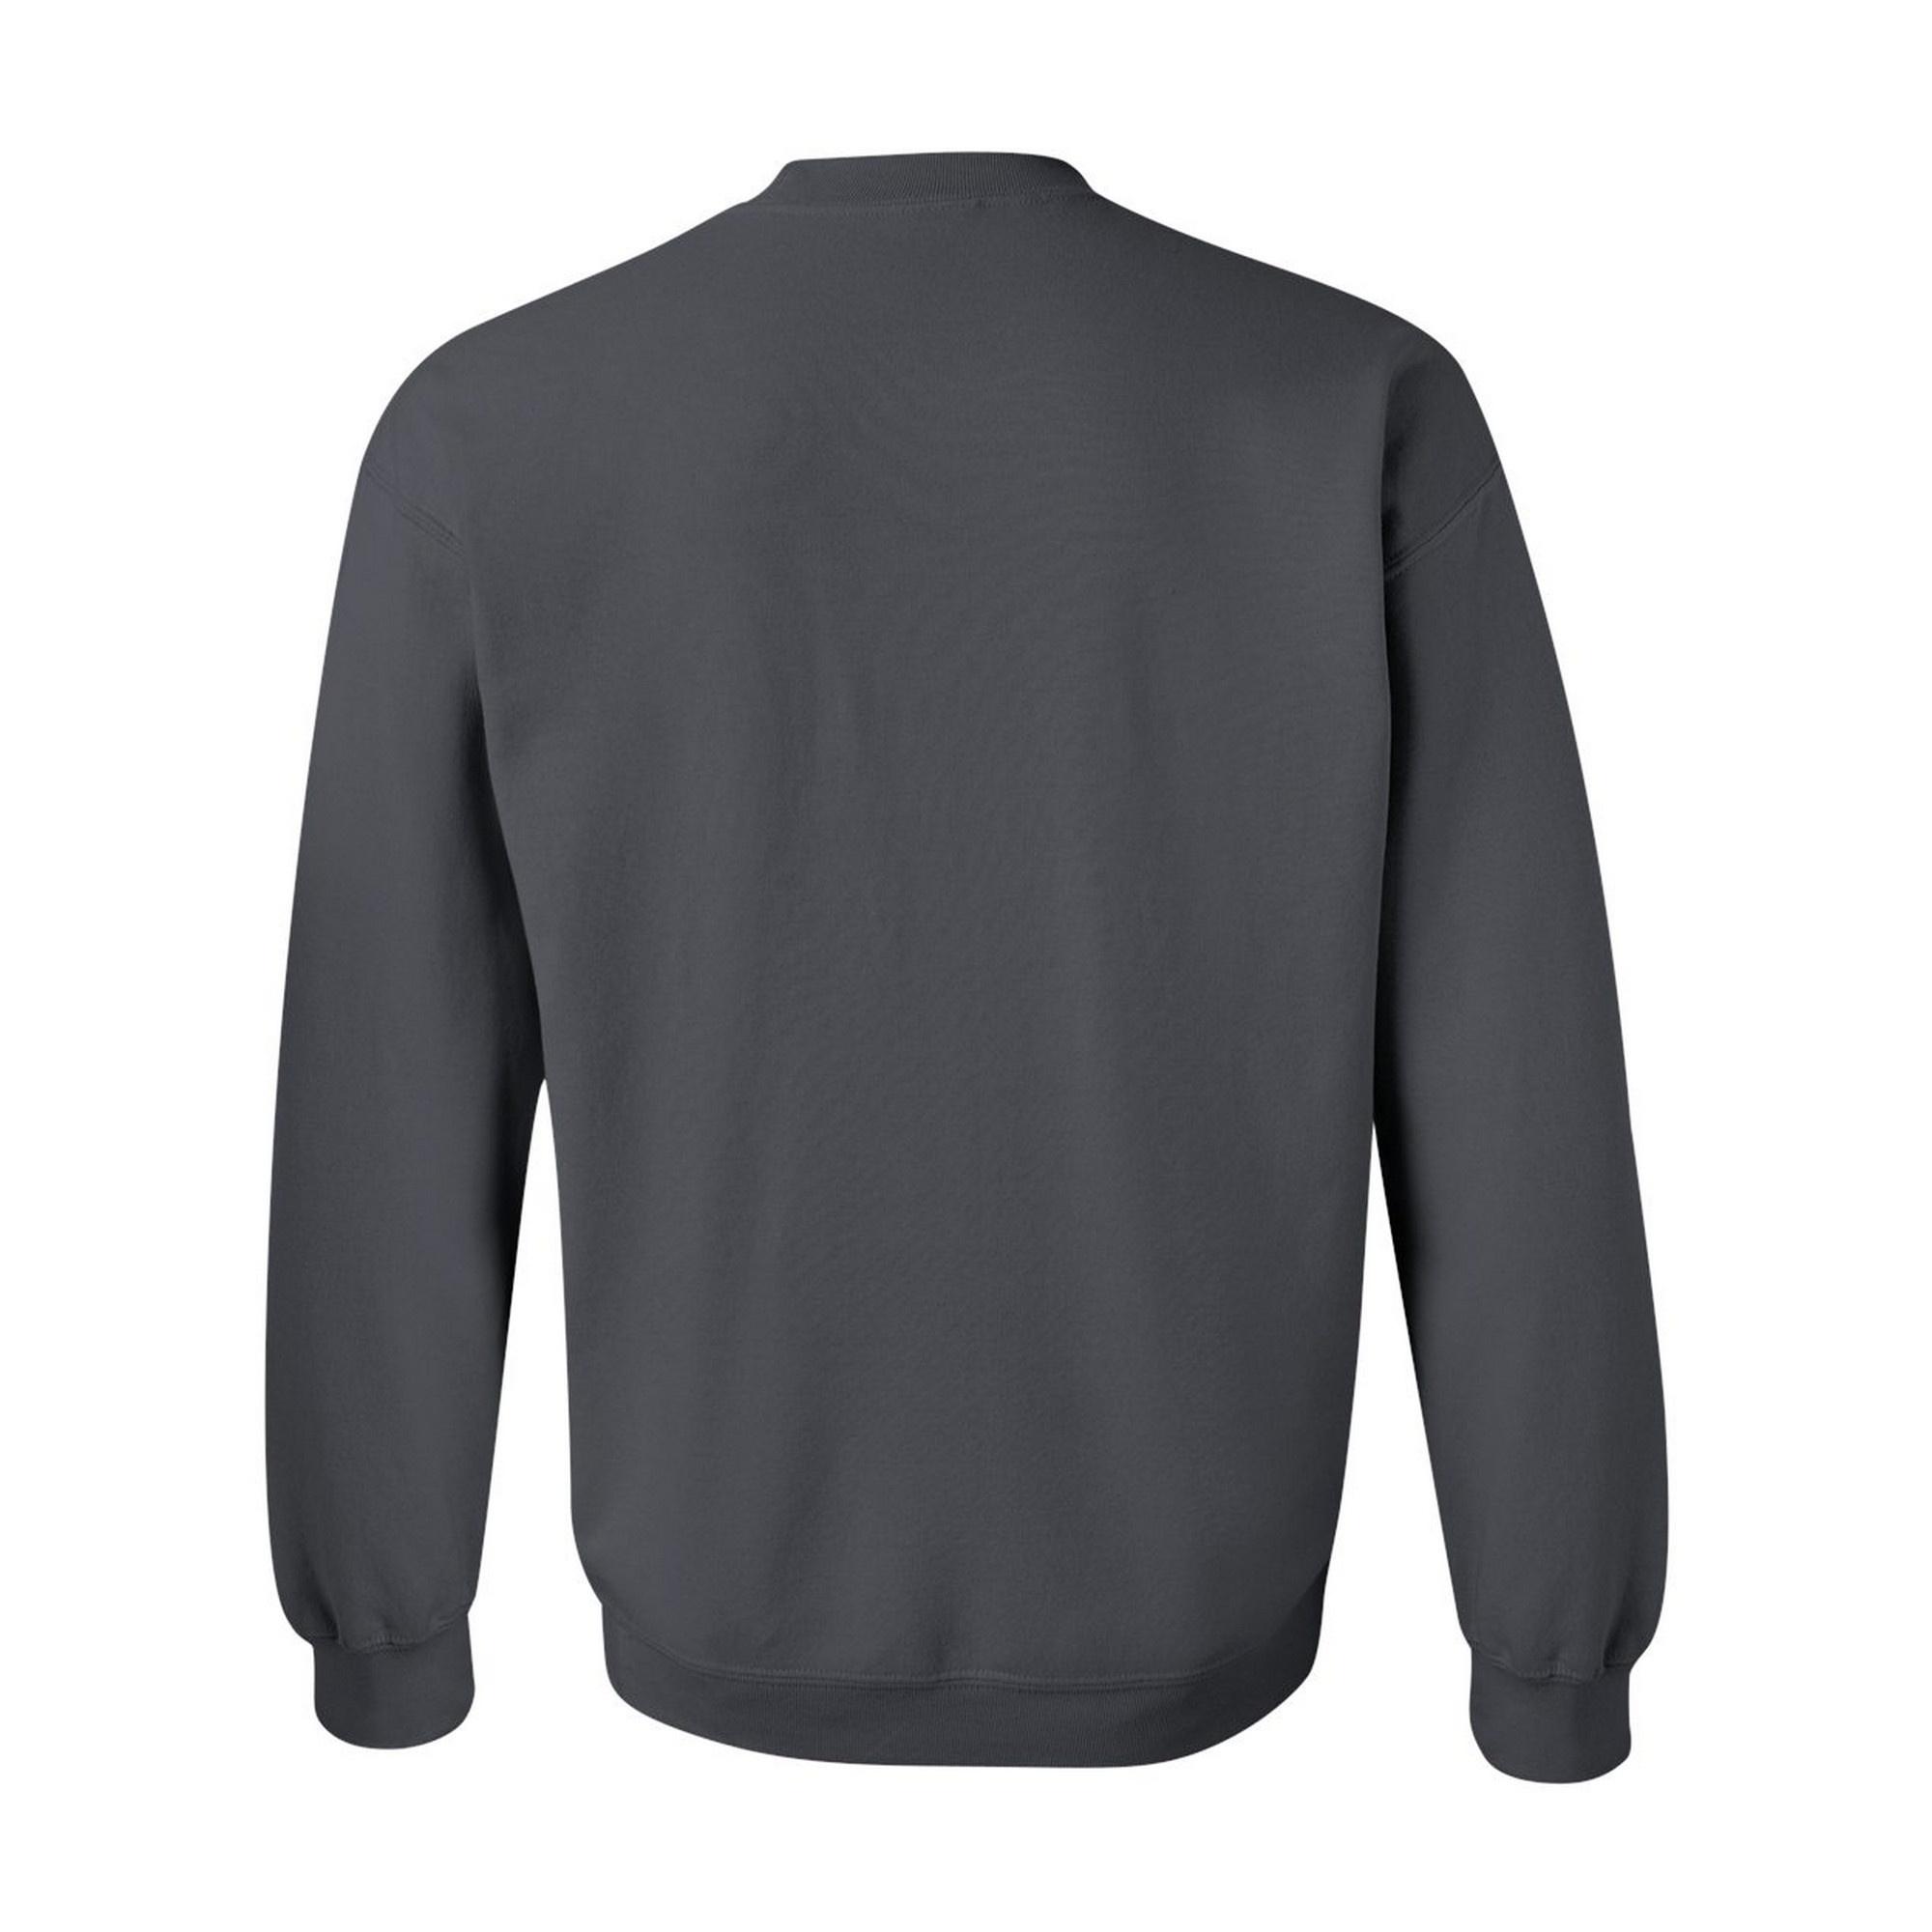 BC463 Gildan Heavy Blend Unisex Adult Mens //Womens Crewneck Plain Sweatshirt